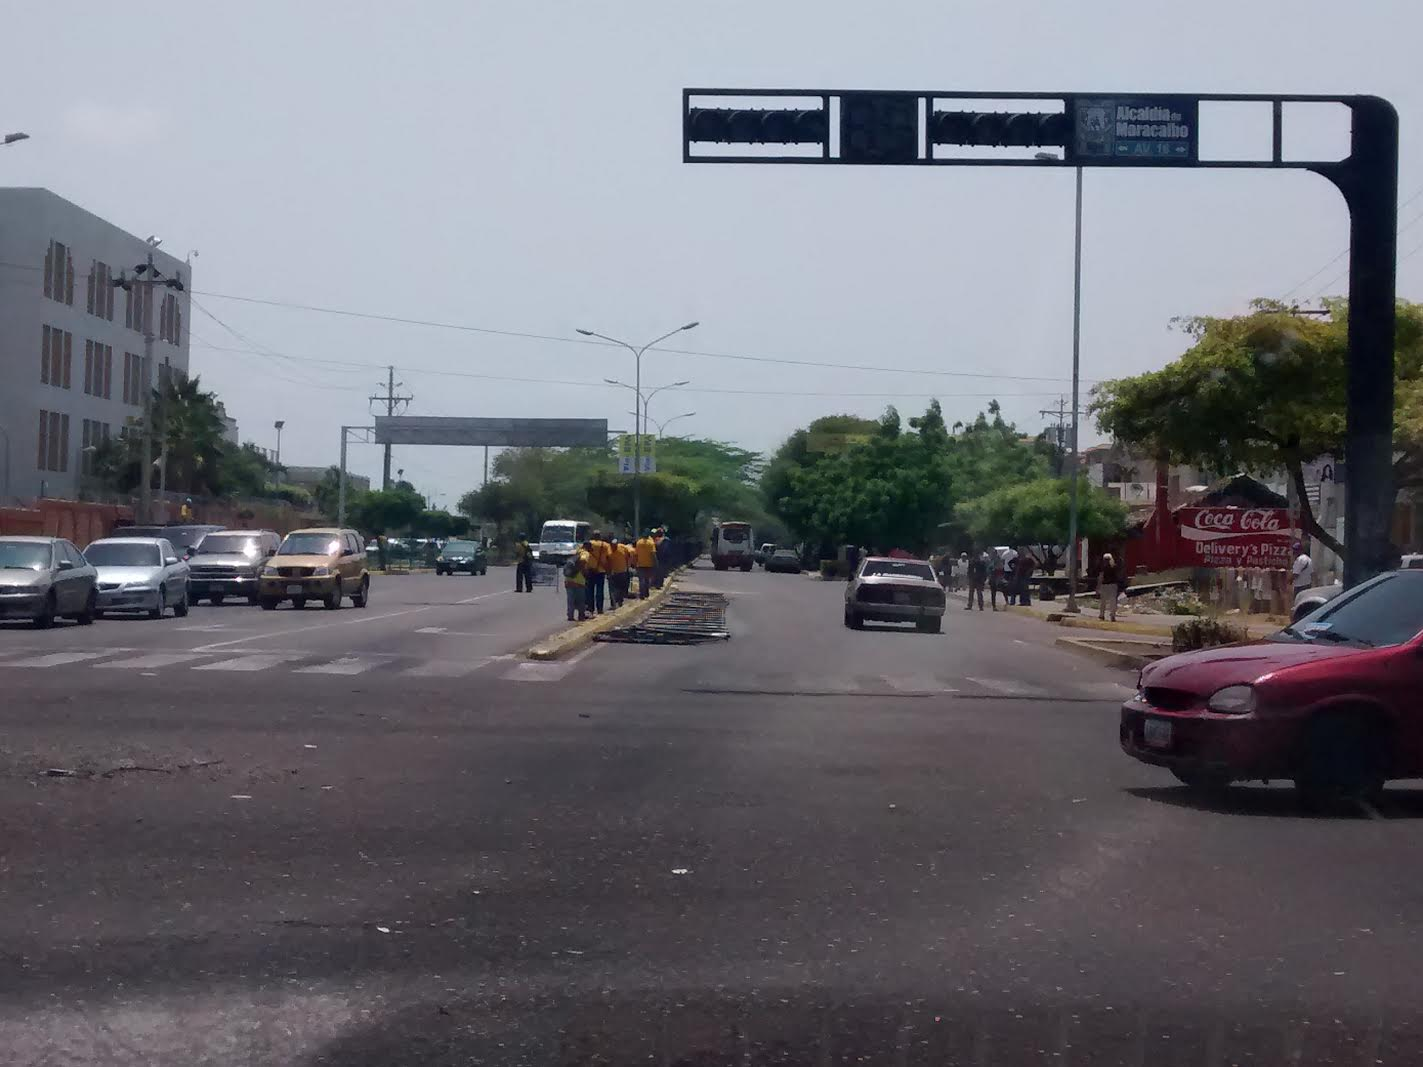 MaracaiboZulia26A17